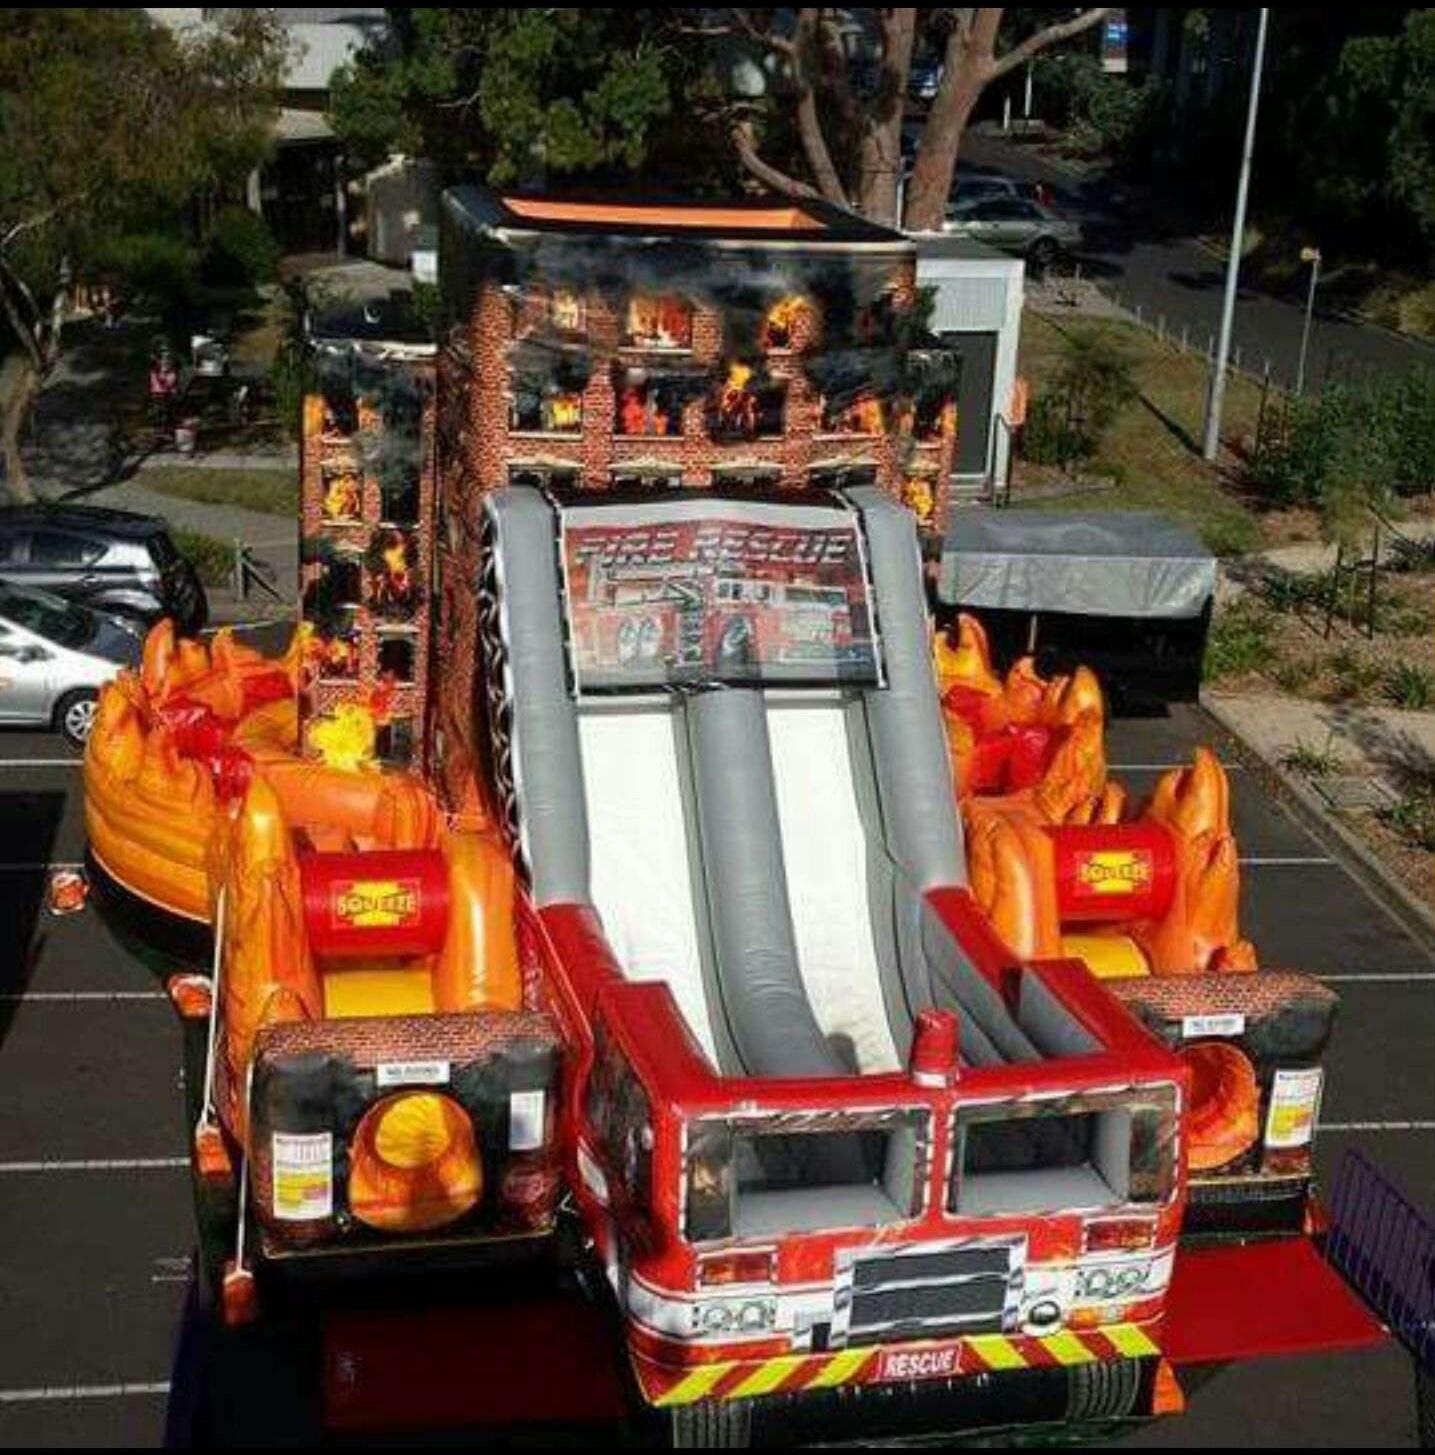 Fire Rescue Challenge 1